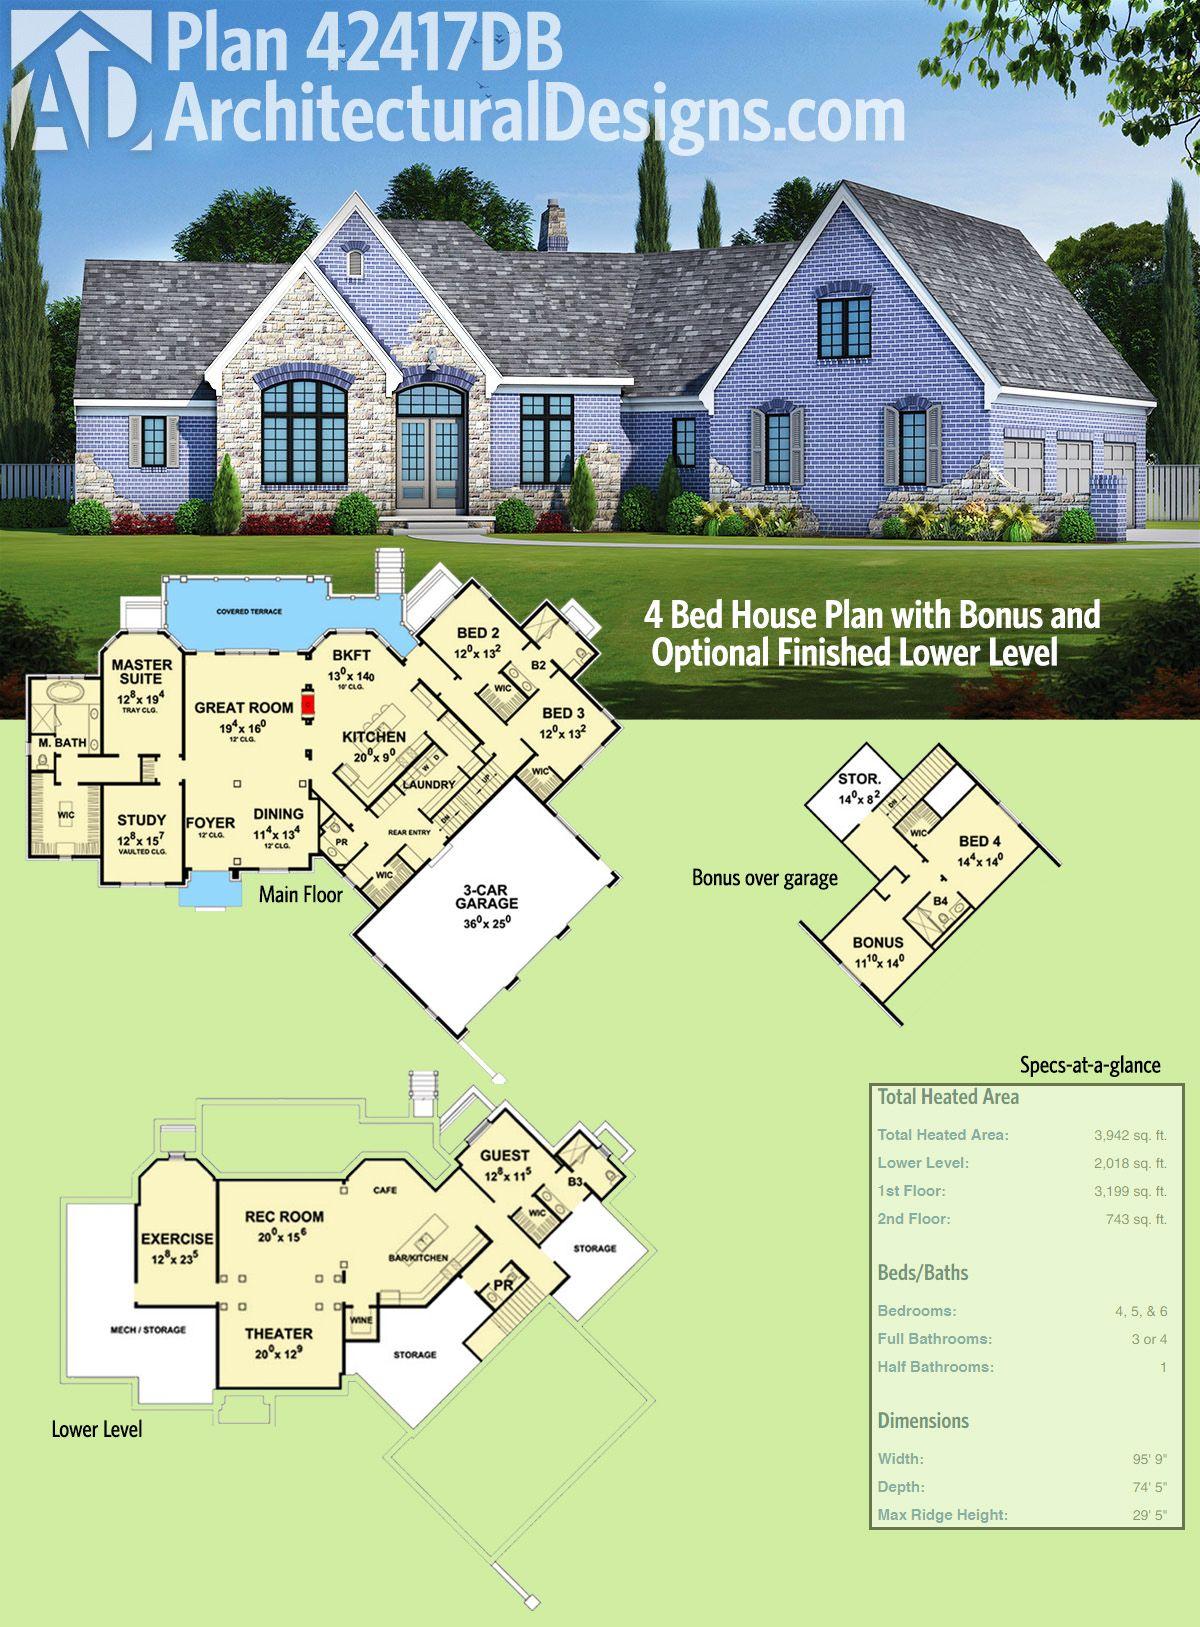 Plan 42417DB 4 Bed House Plan with Bonus and Optional